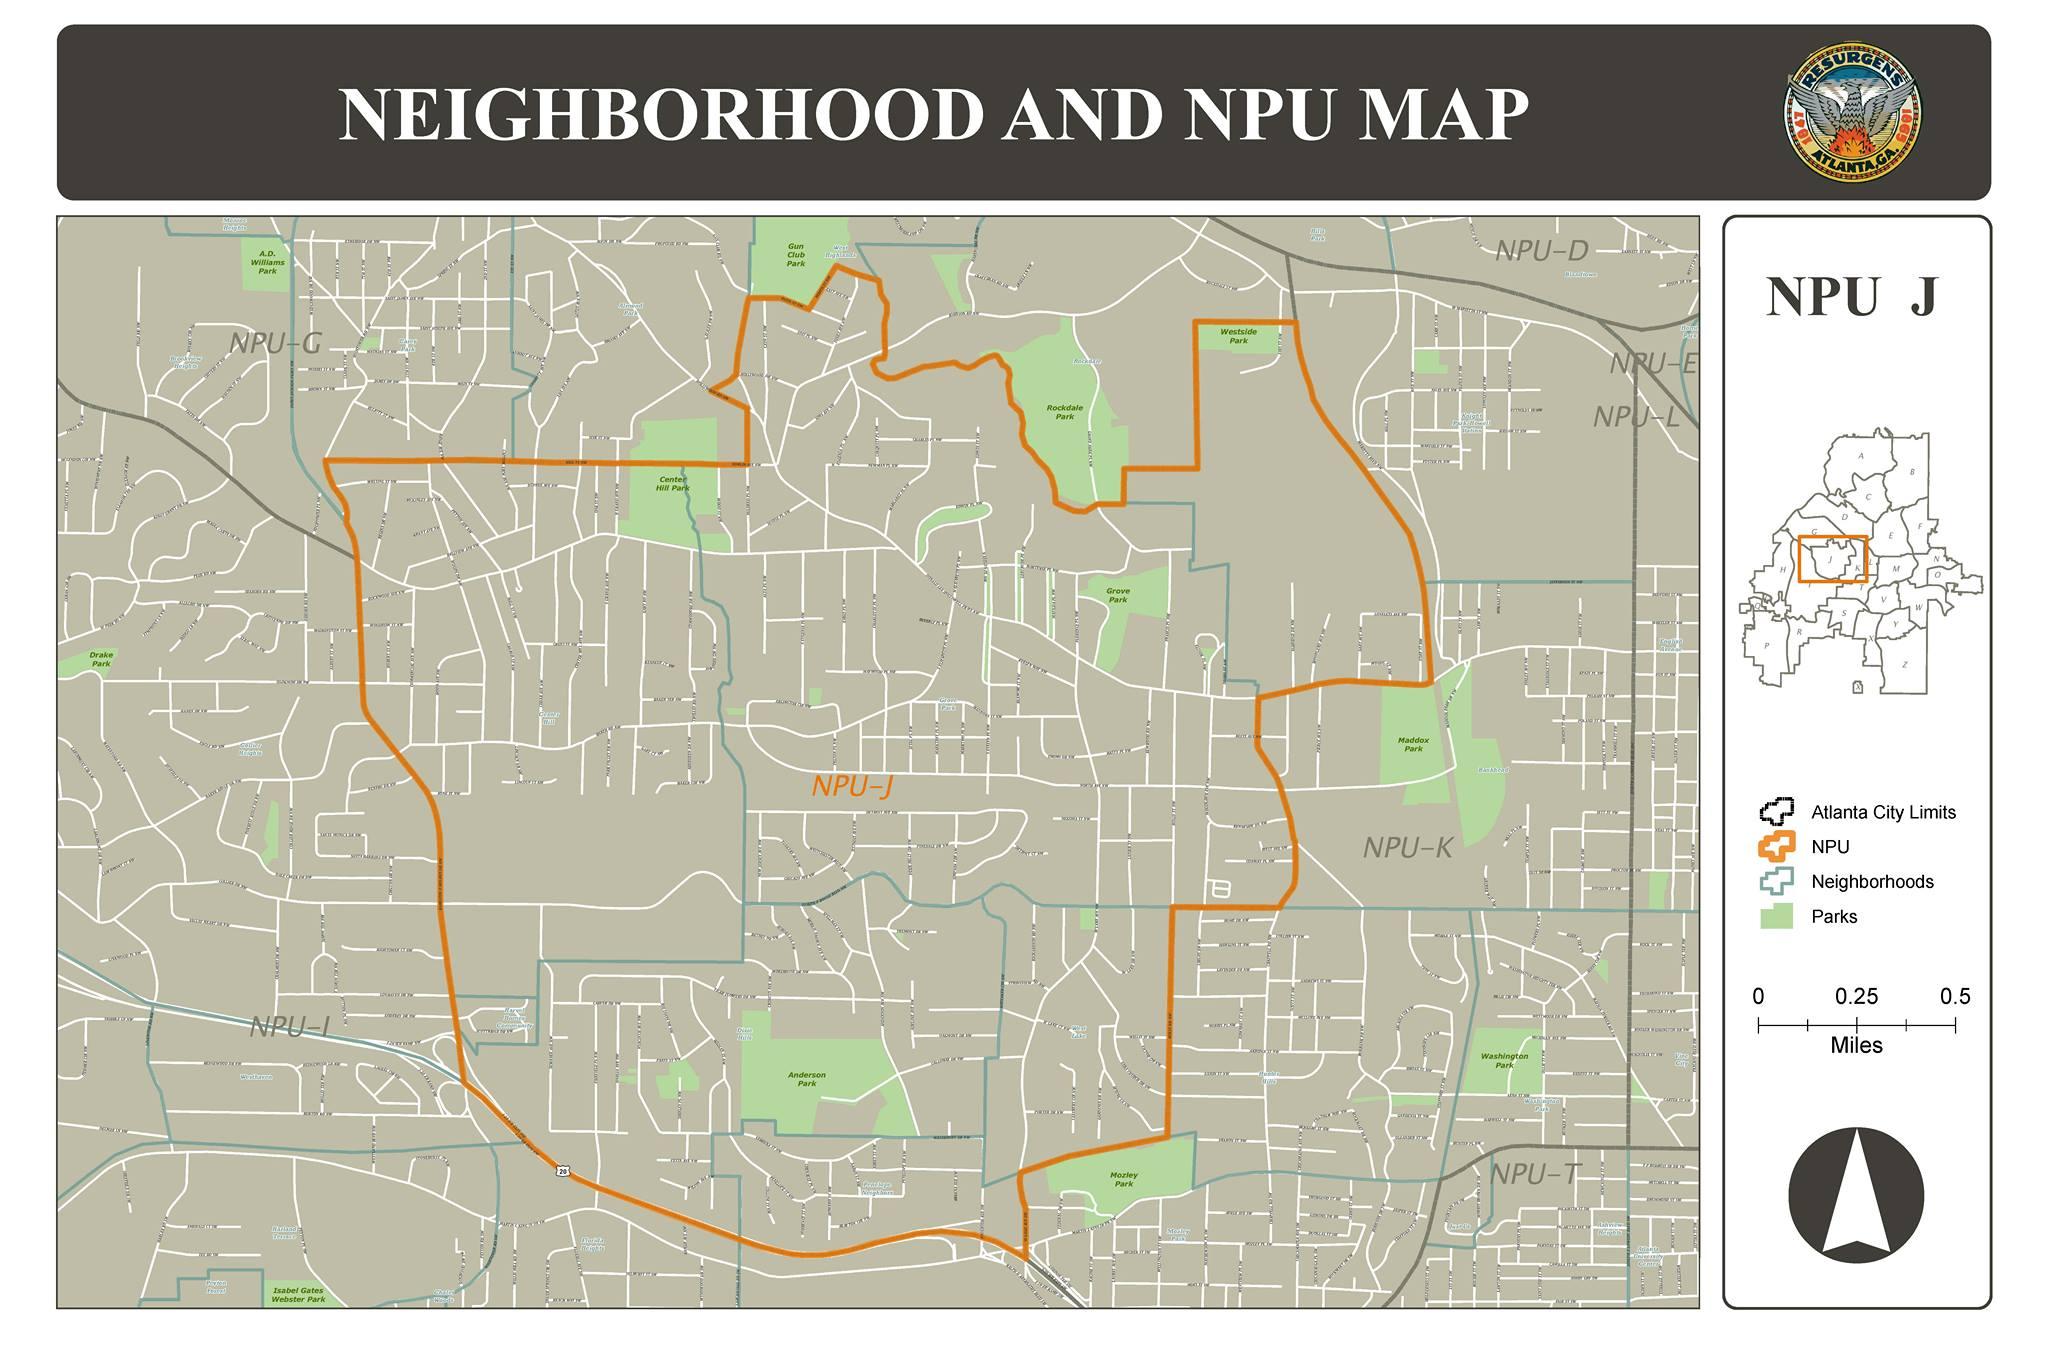 NPU-J map